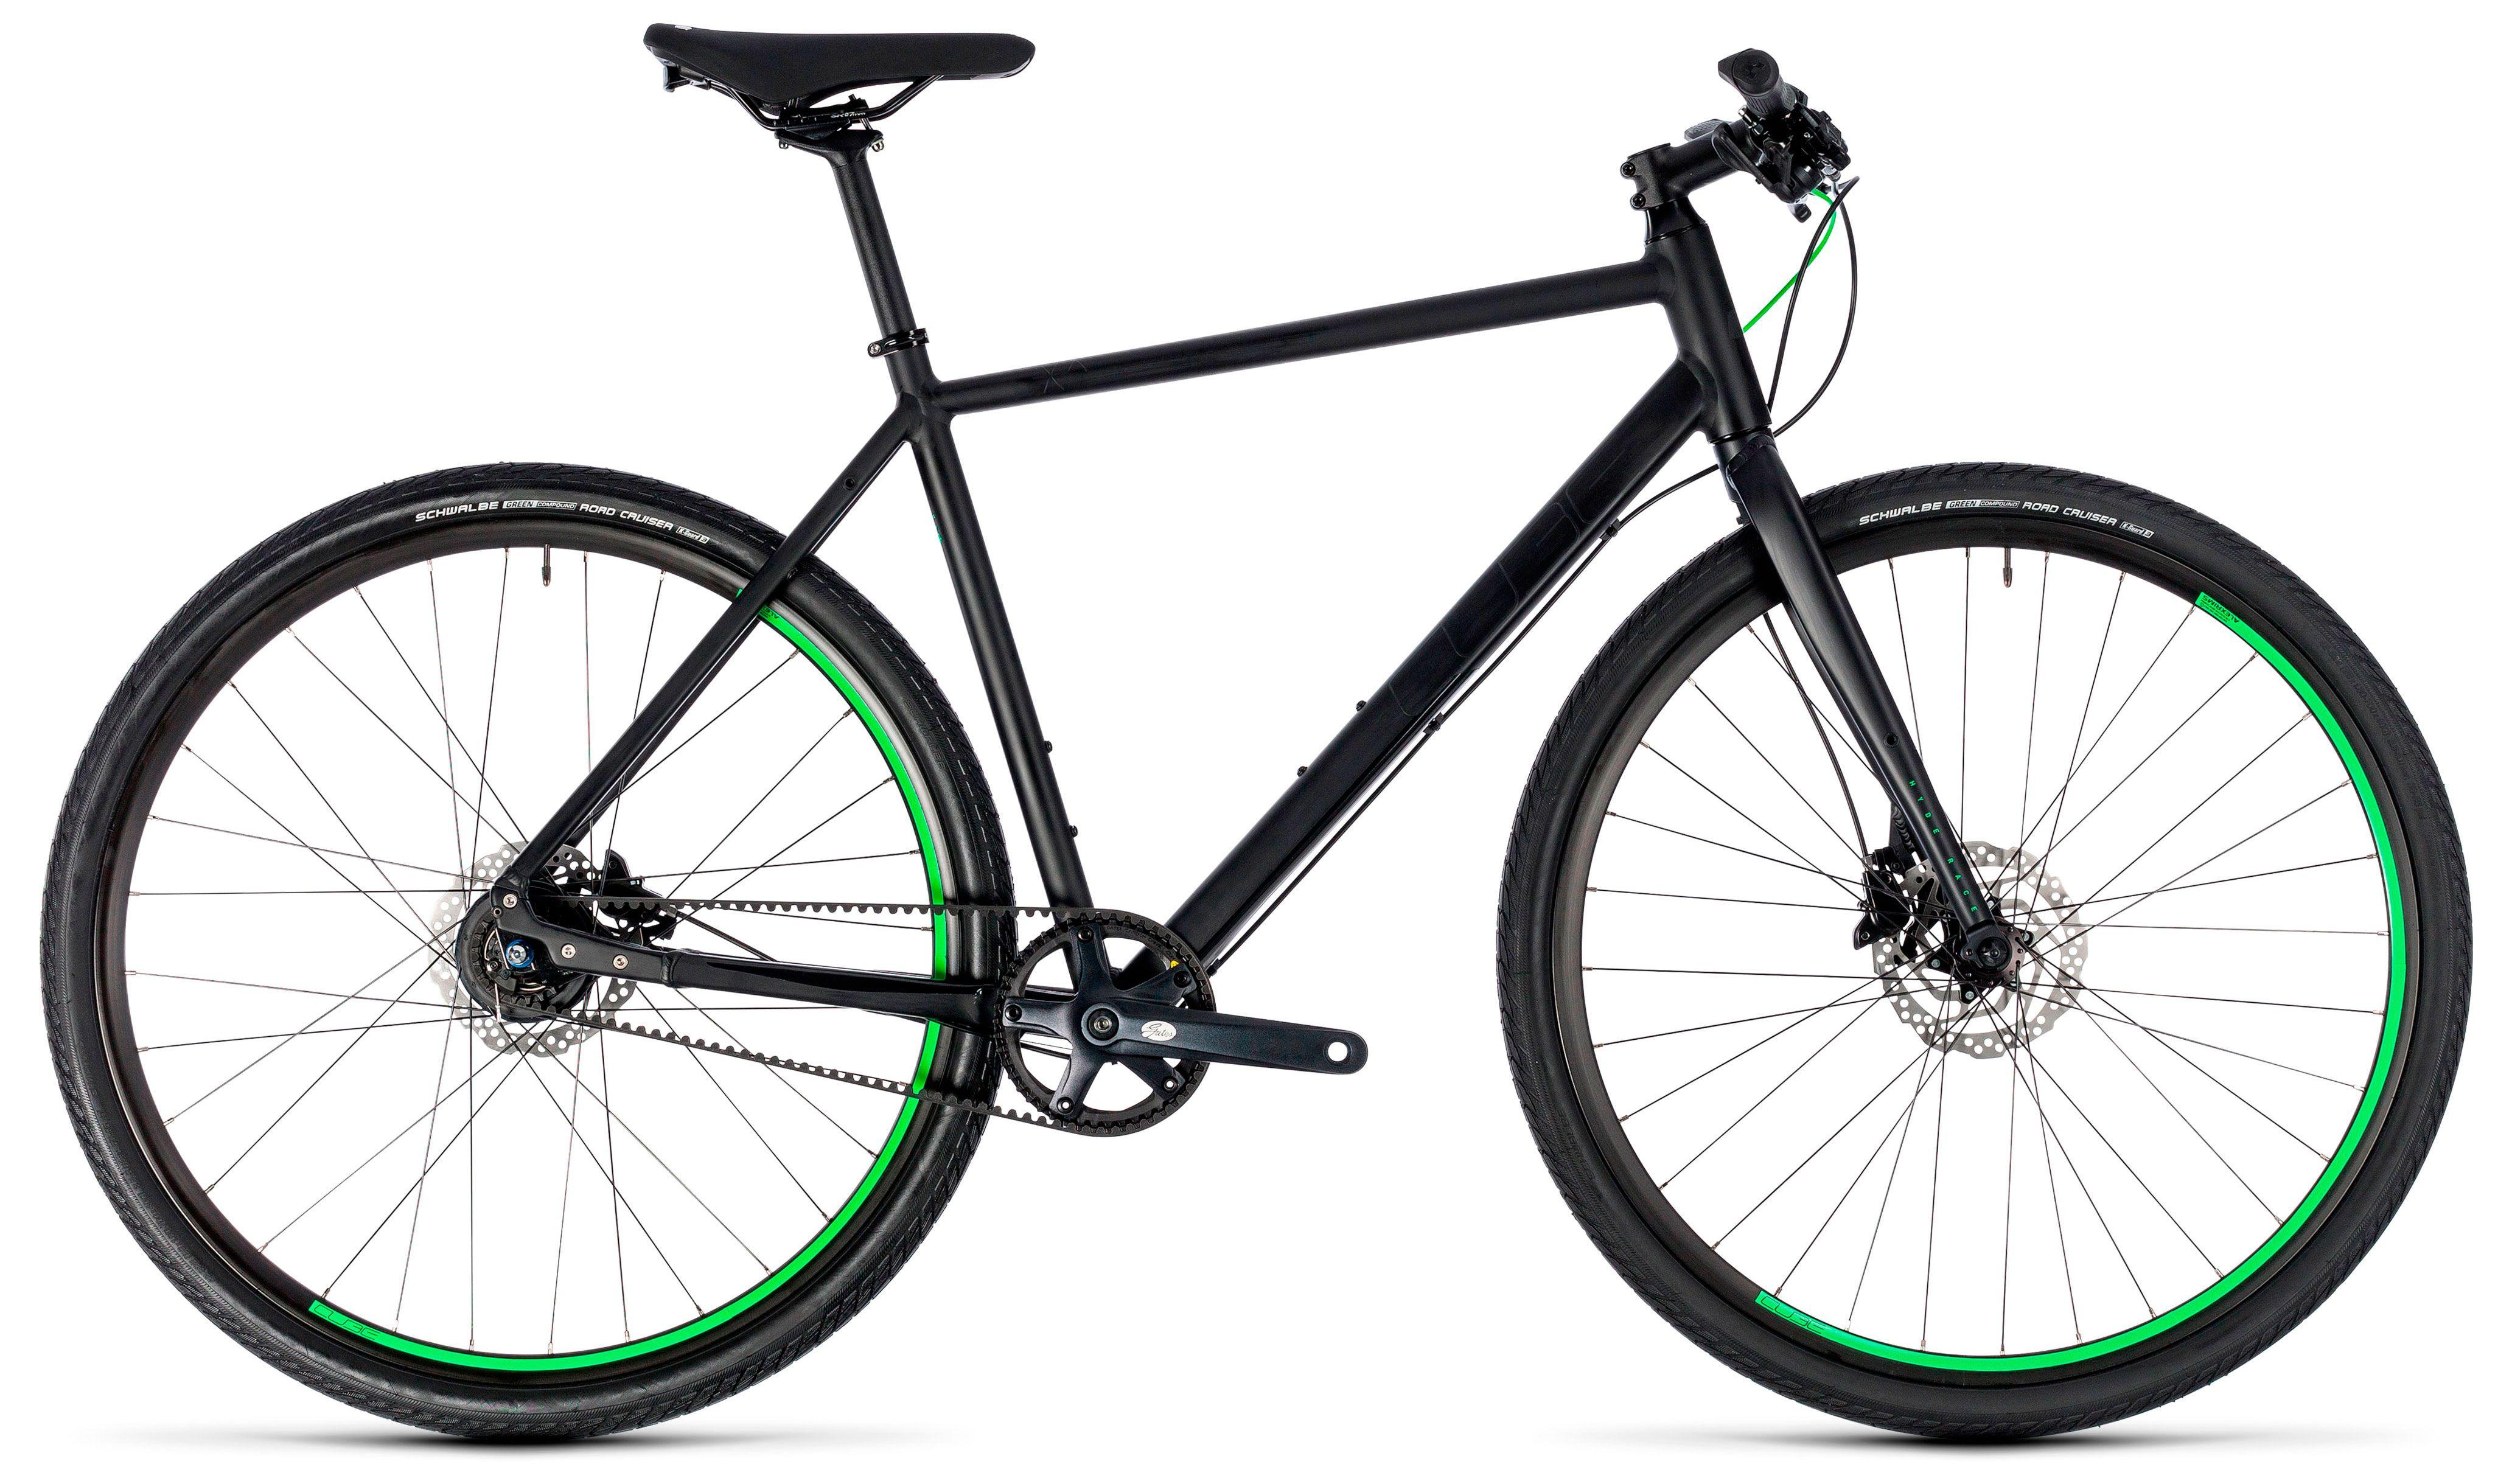 Велосипед Cube Hyde Race 2018 велосипед cube stereo 160 hpa race 27 5 2017